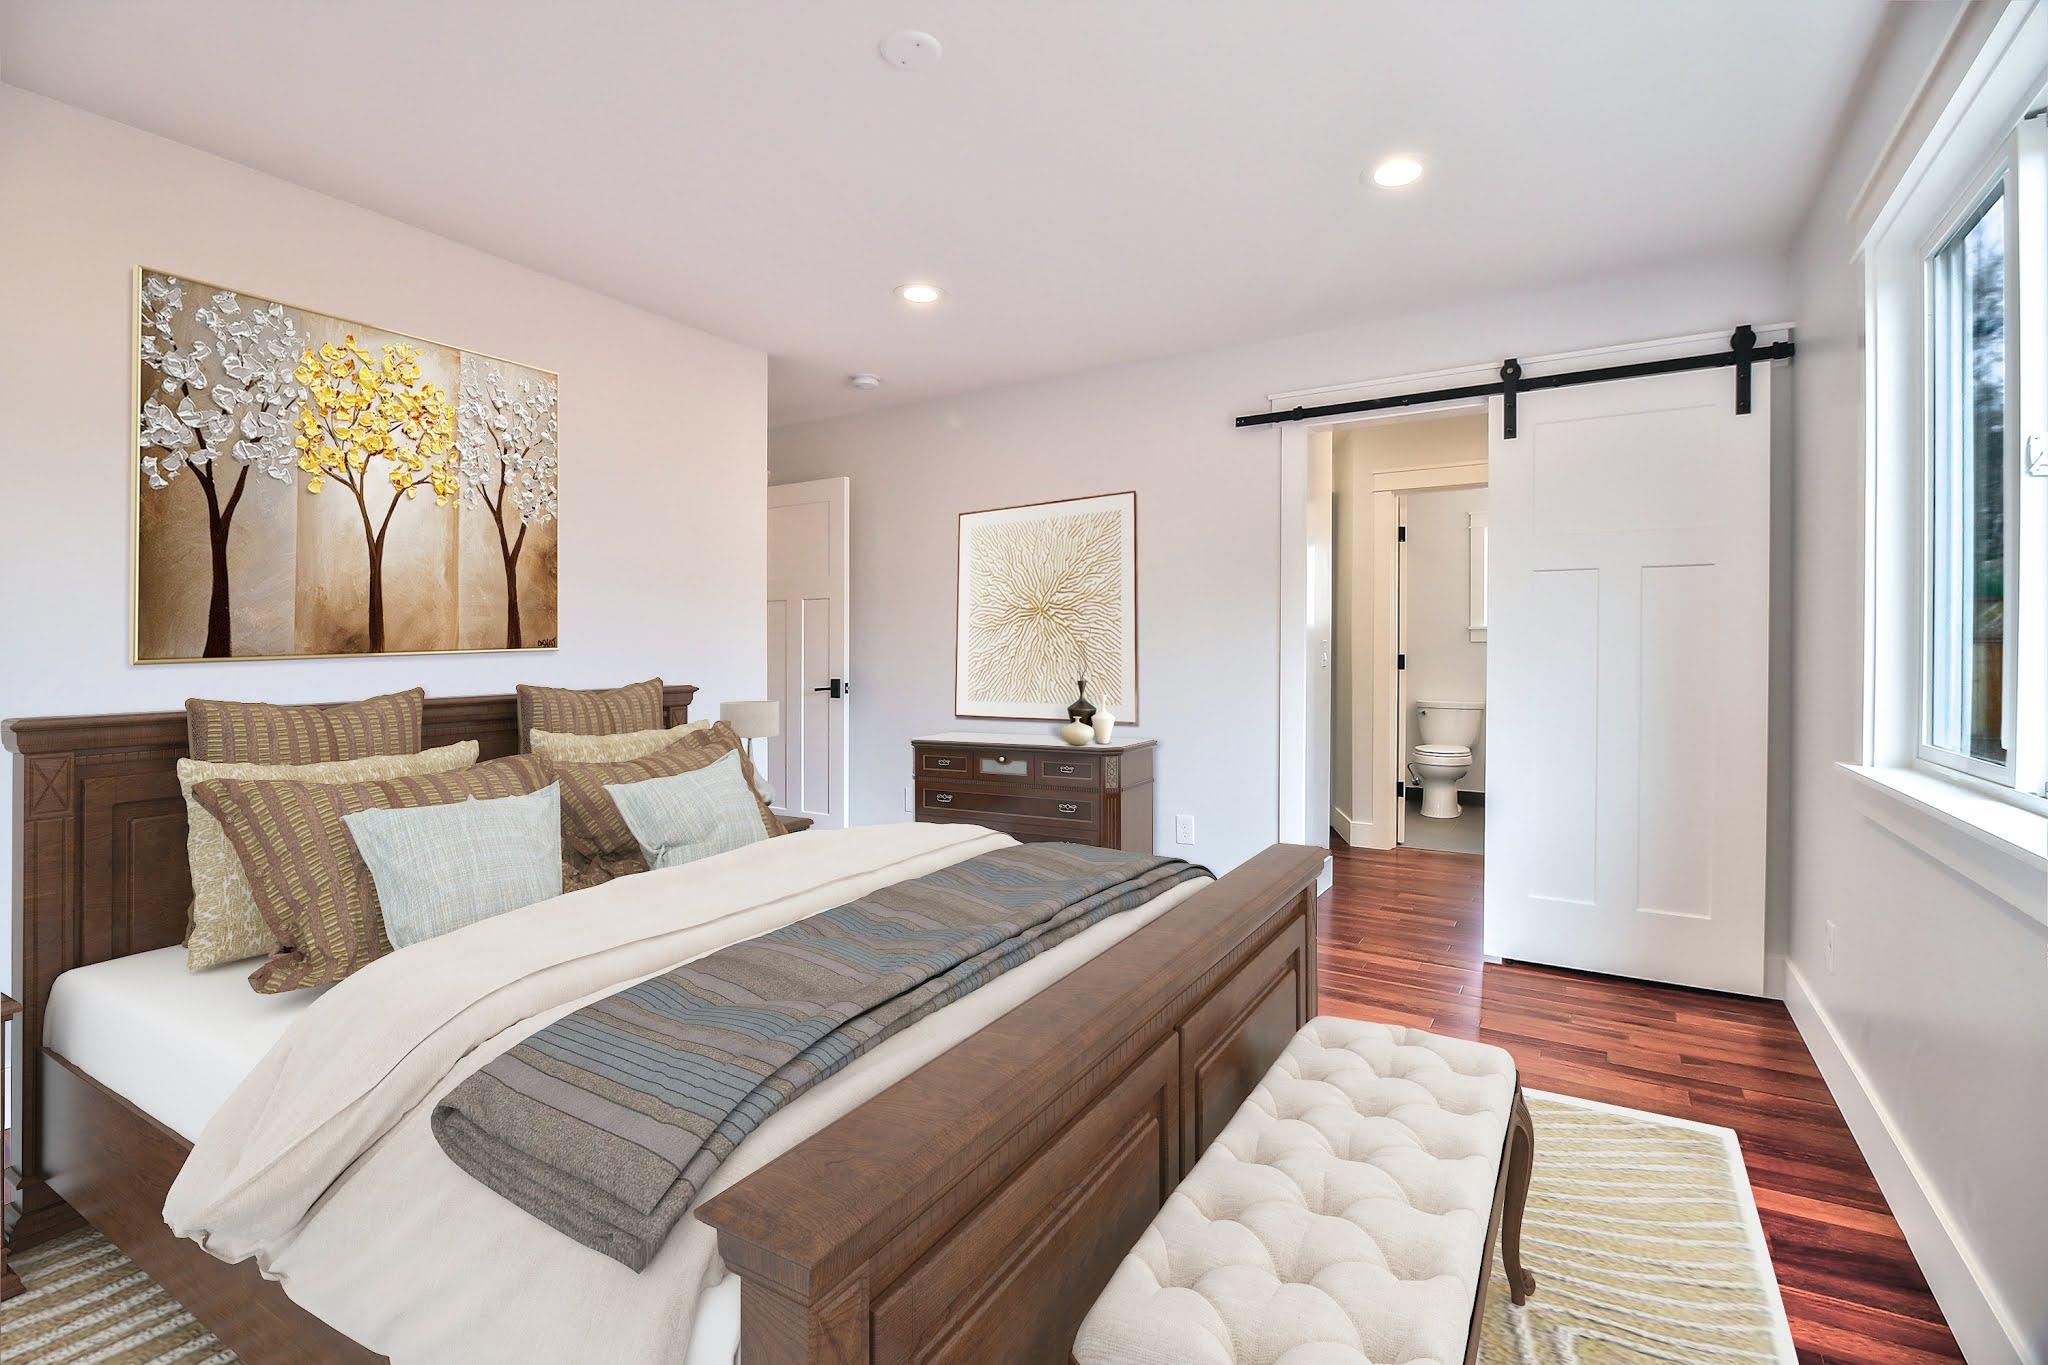 desain interior kamar tidur minimalis ukuran 4x4 sederhana tapi elegan